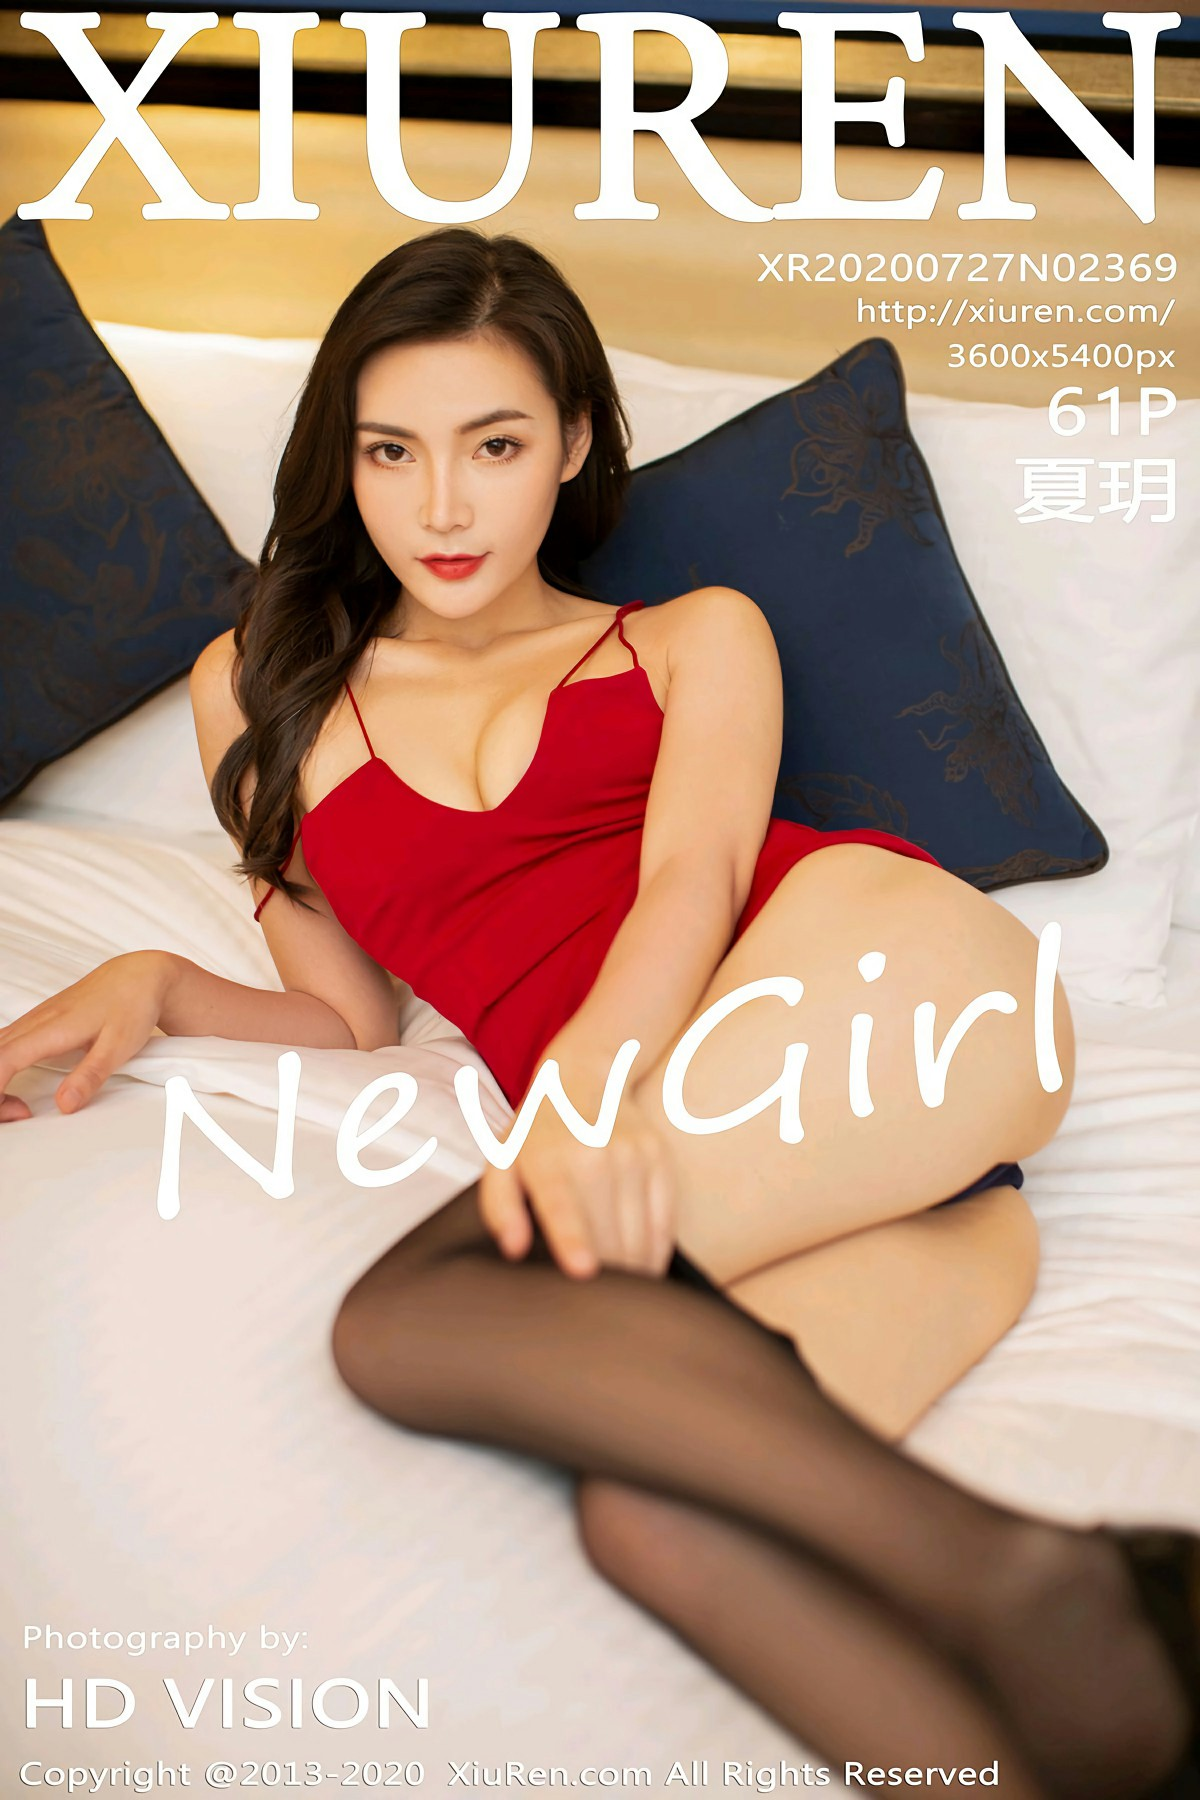 [XiuRen秀人网] 2020.07.27 No.2369 夏玥 第1张